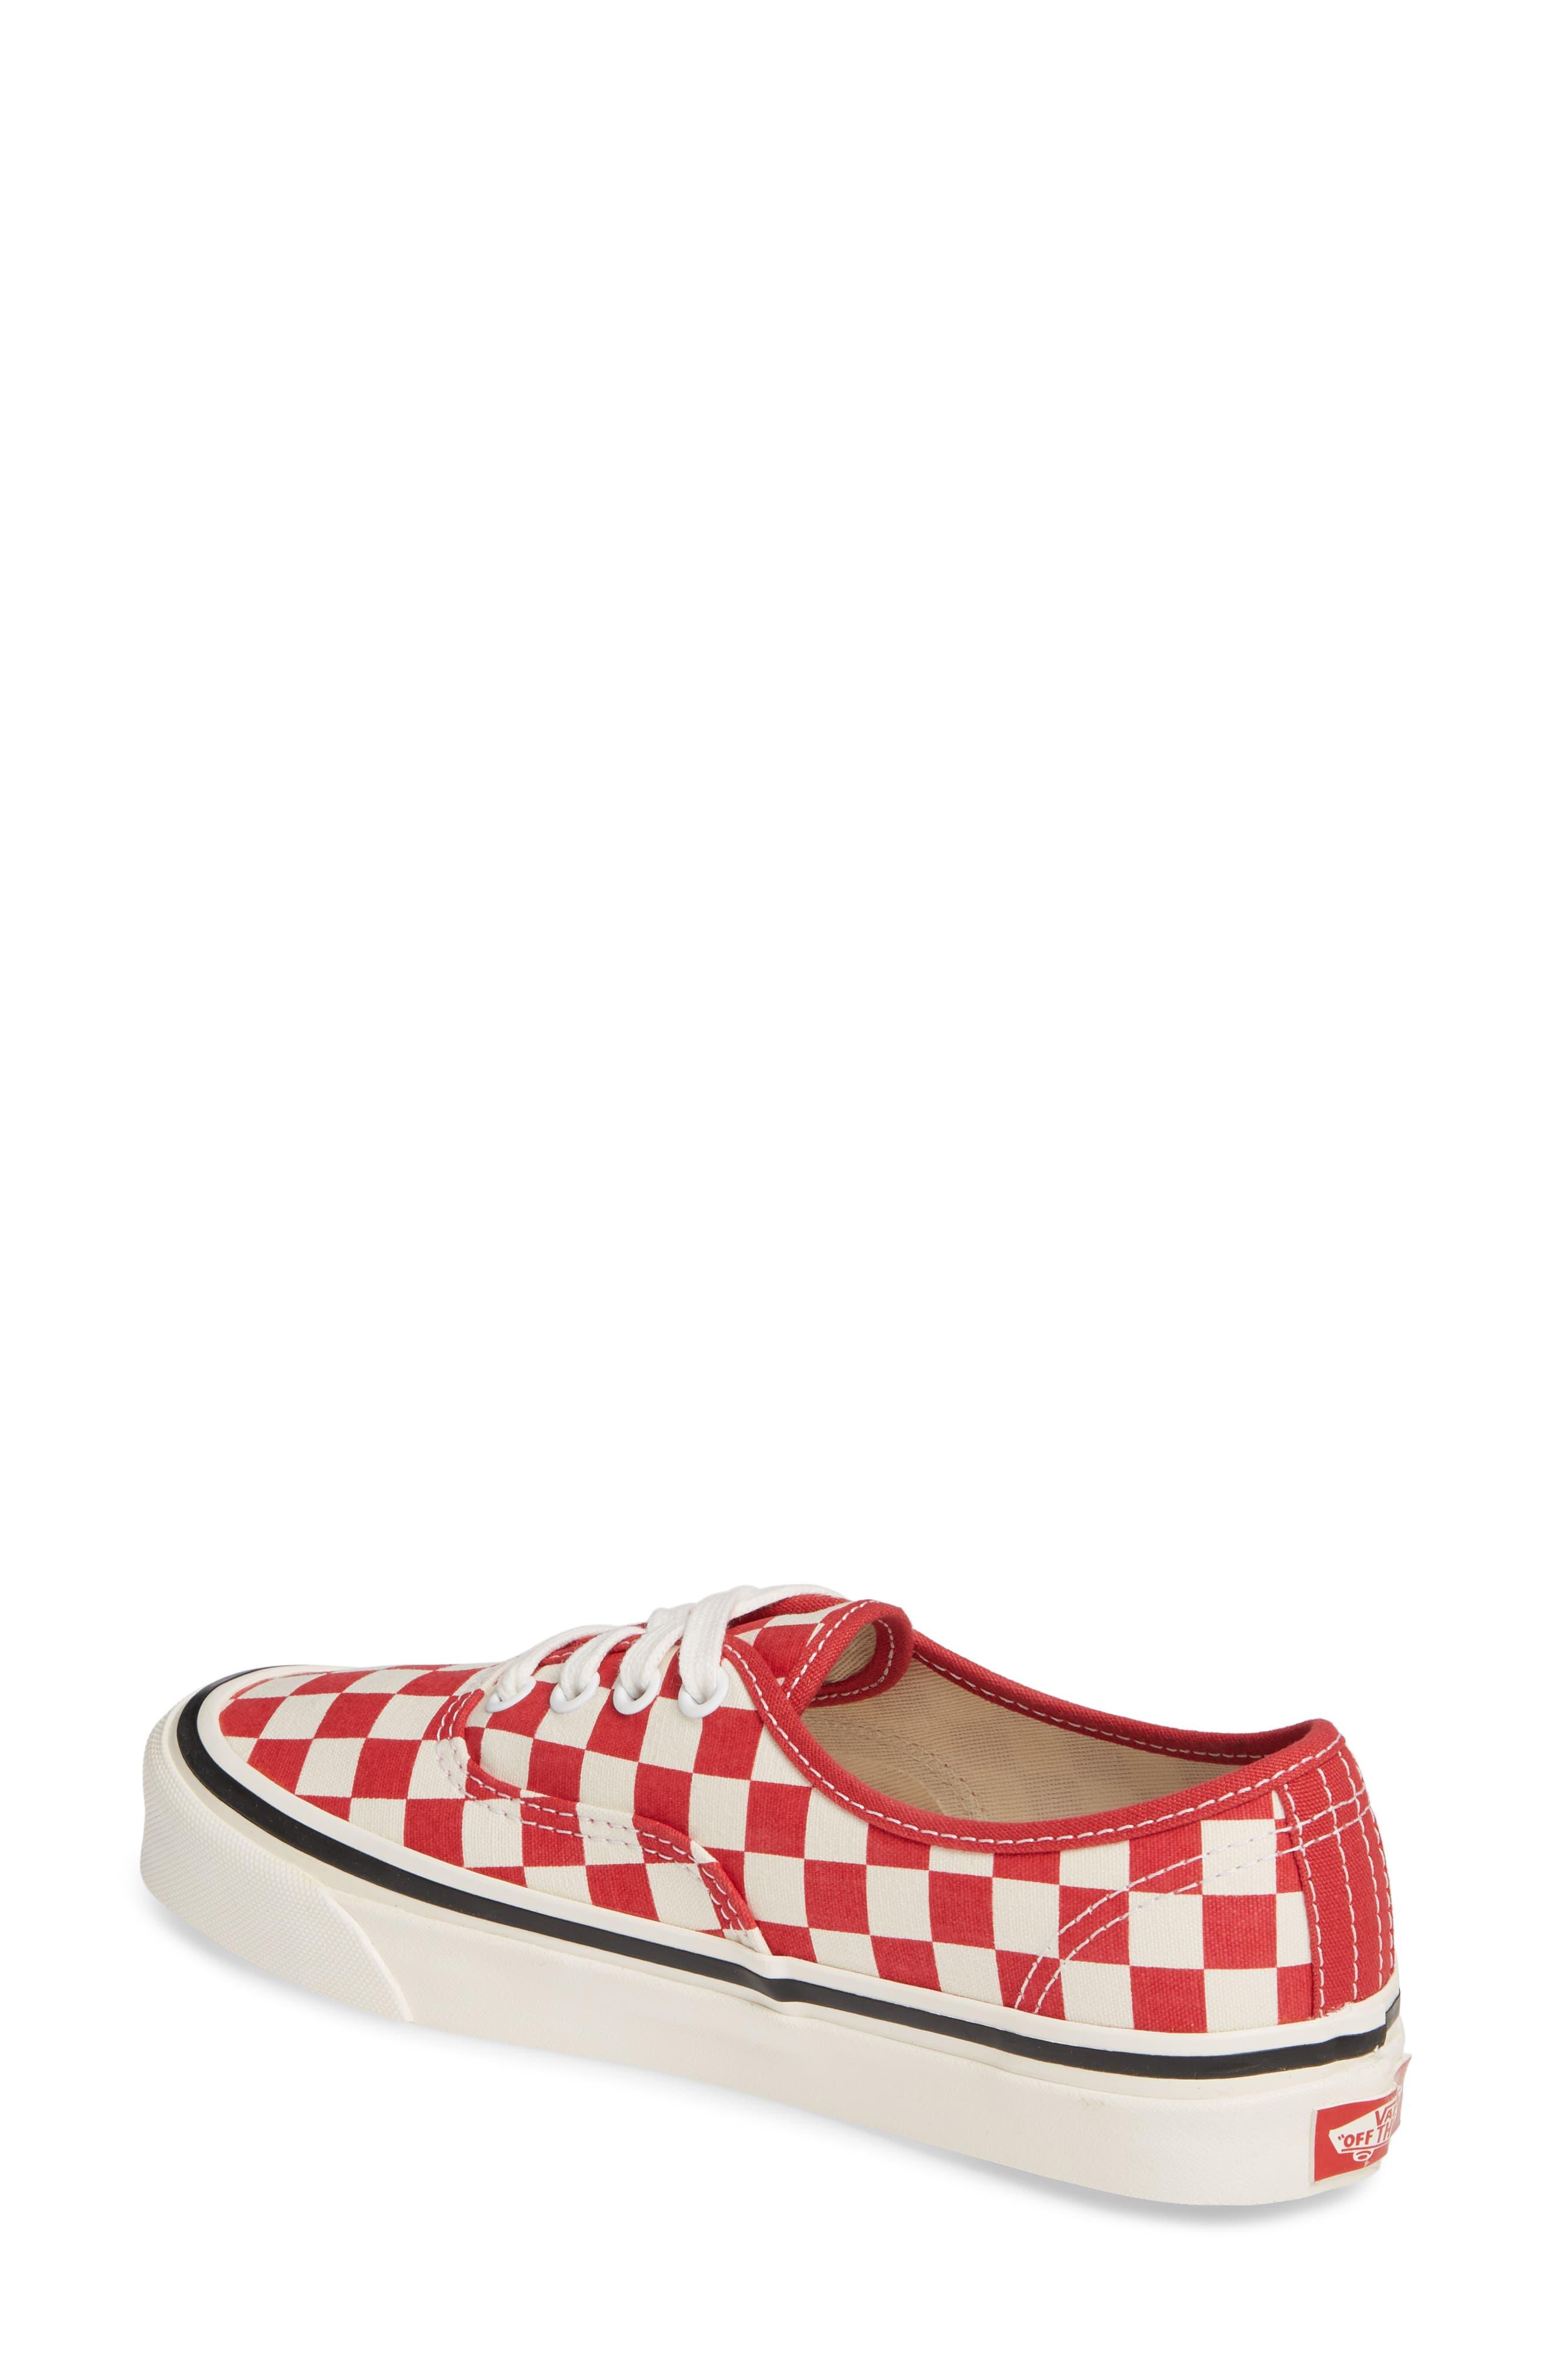 VANS, Authentic 44 DX Sneaker, Alternate thumbnail 2, color, RED/ CHECK